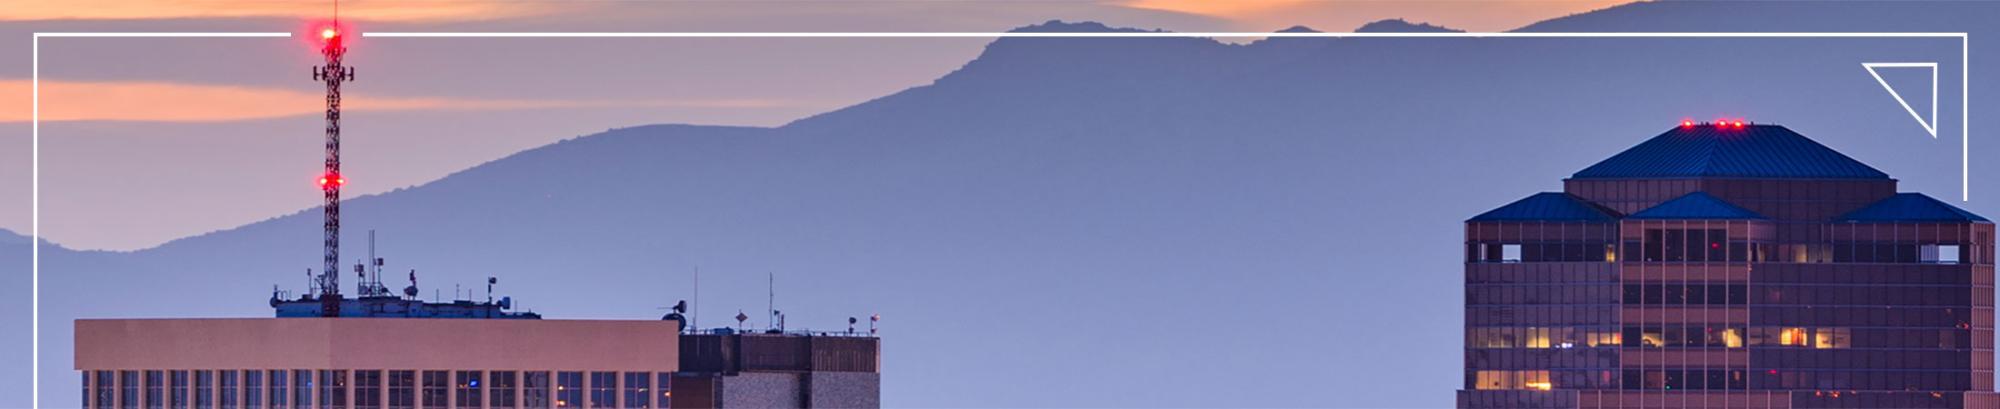 tucson arizona skyline at evening